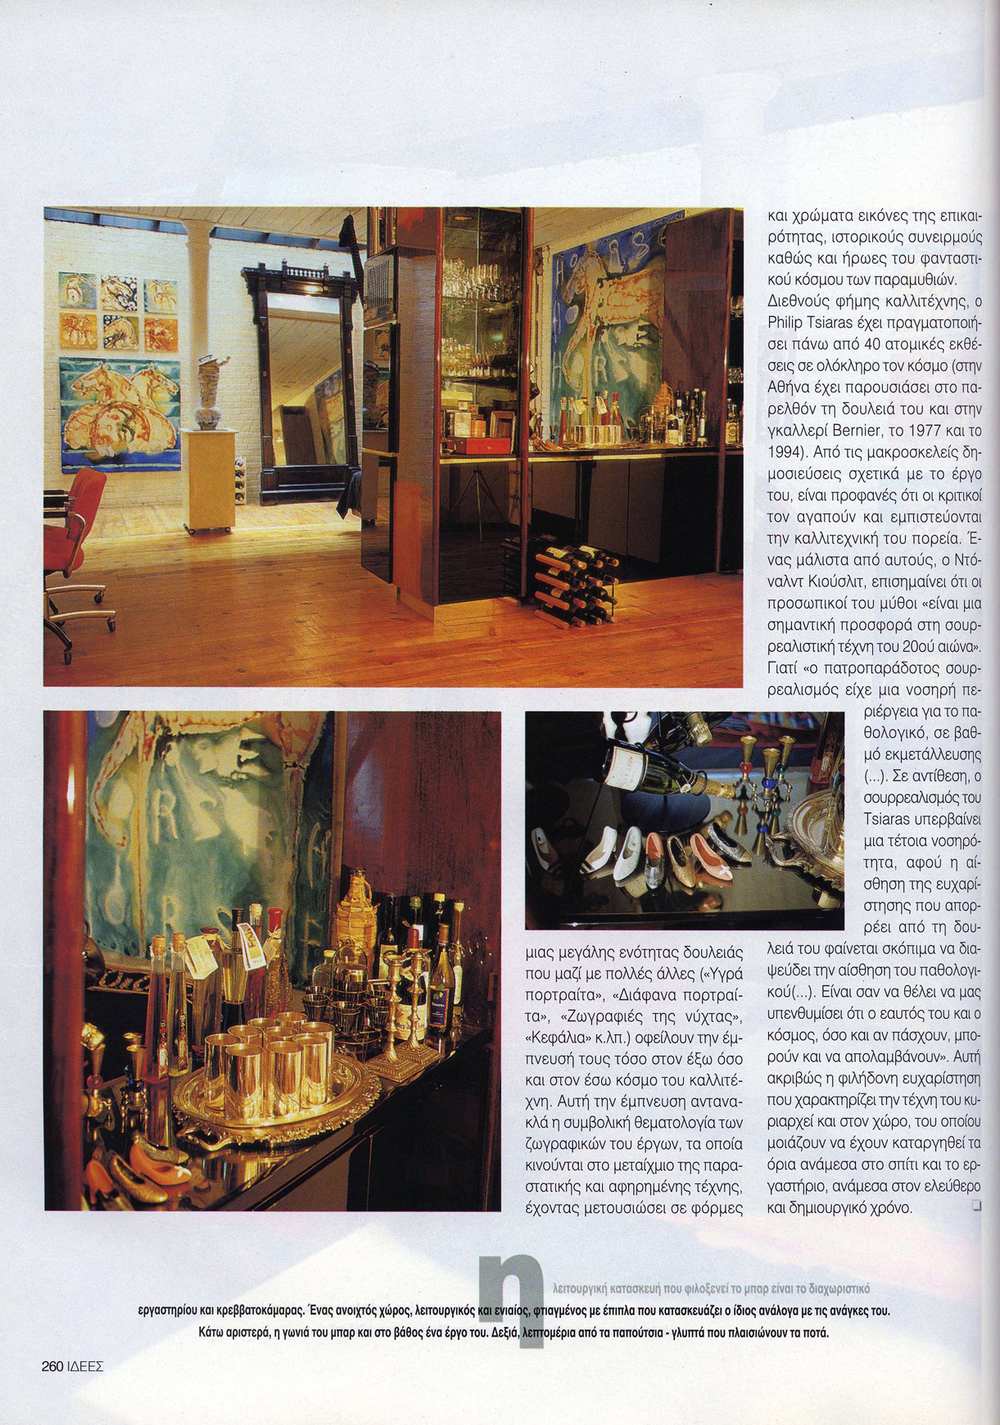 ideas-july-99-pg7.jpg